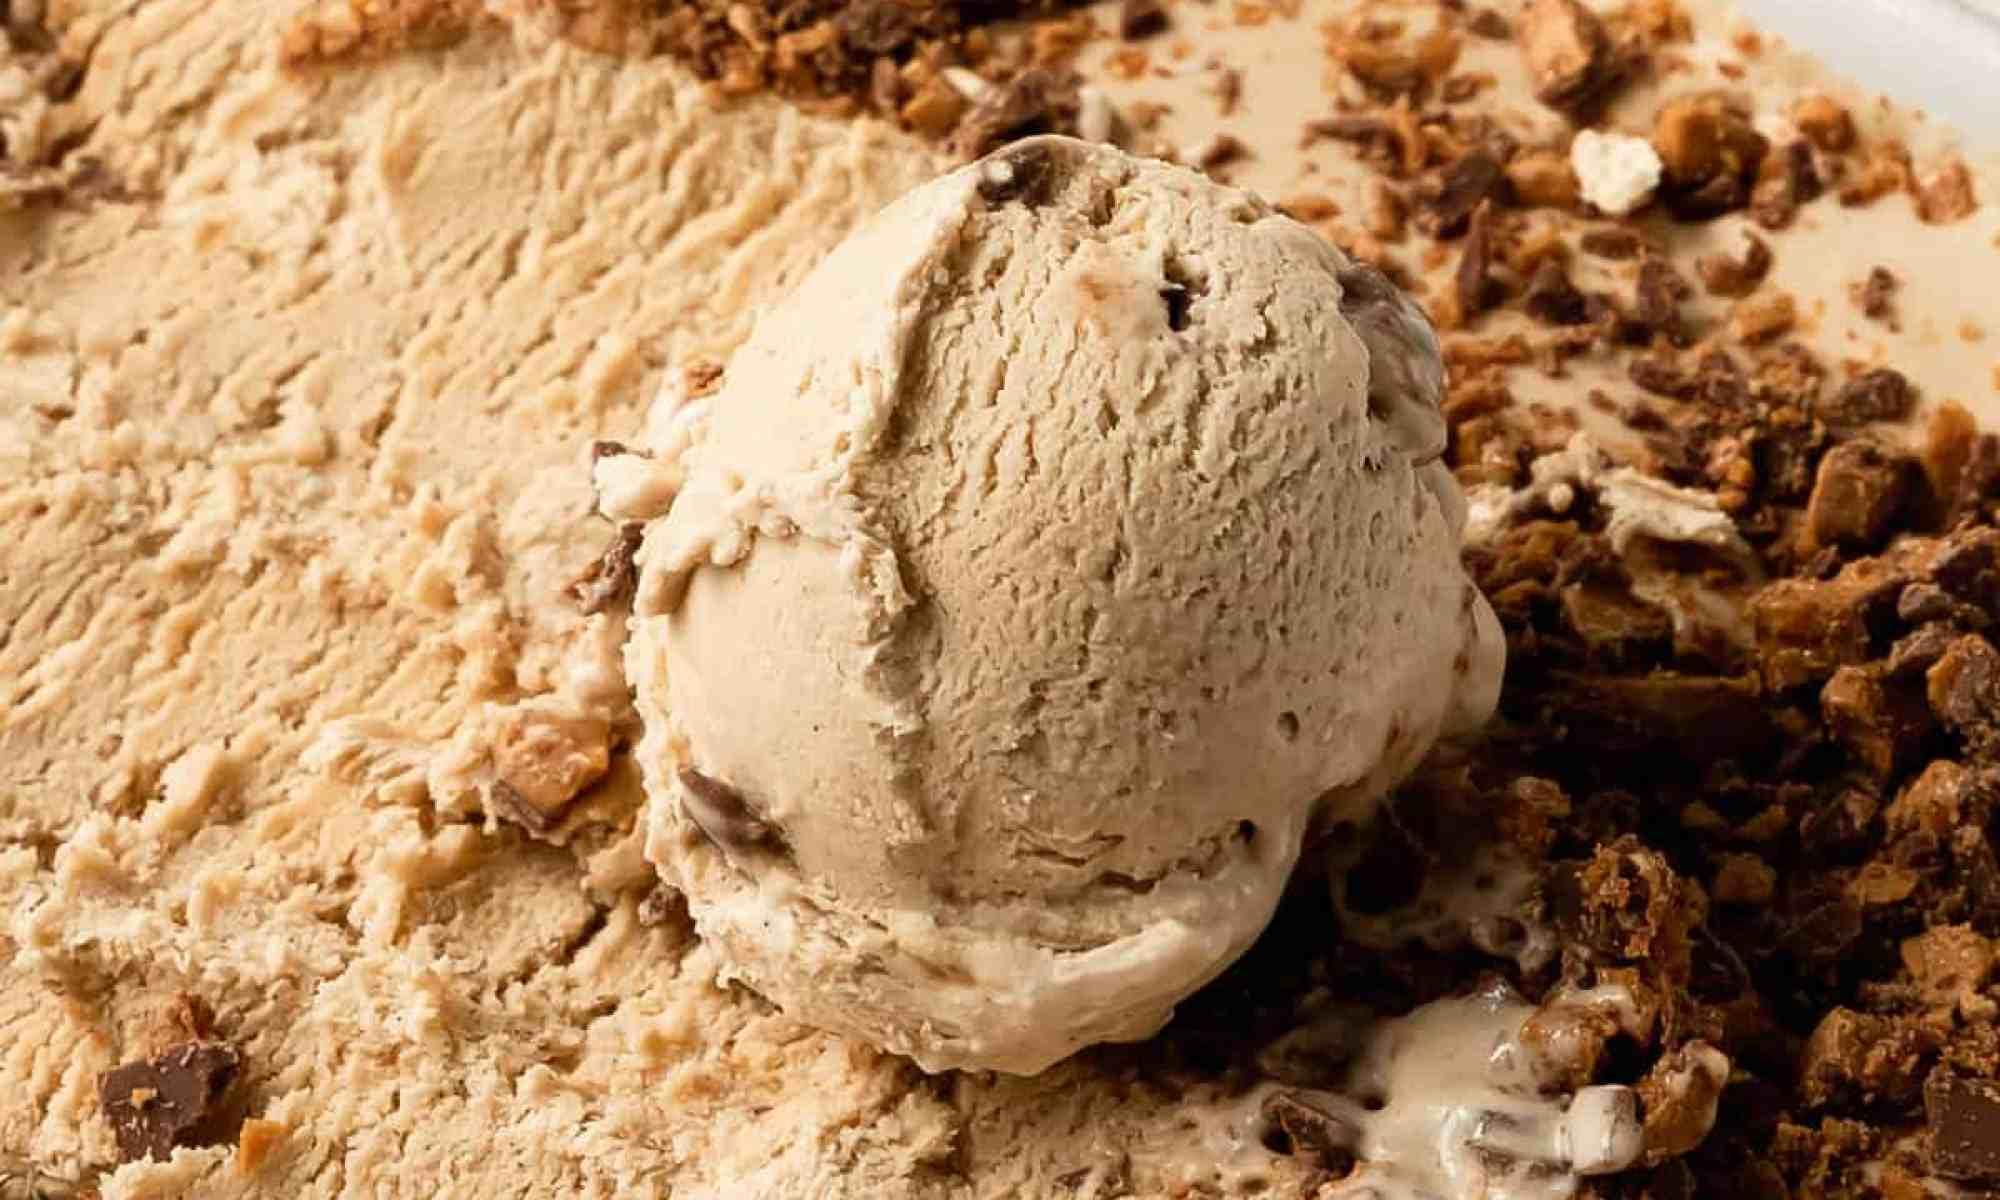 Guiness toffee ice cream